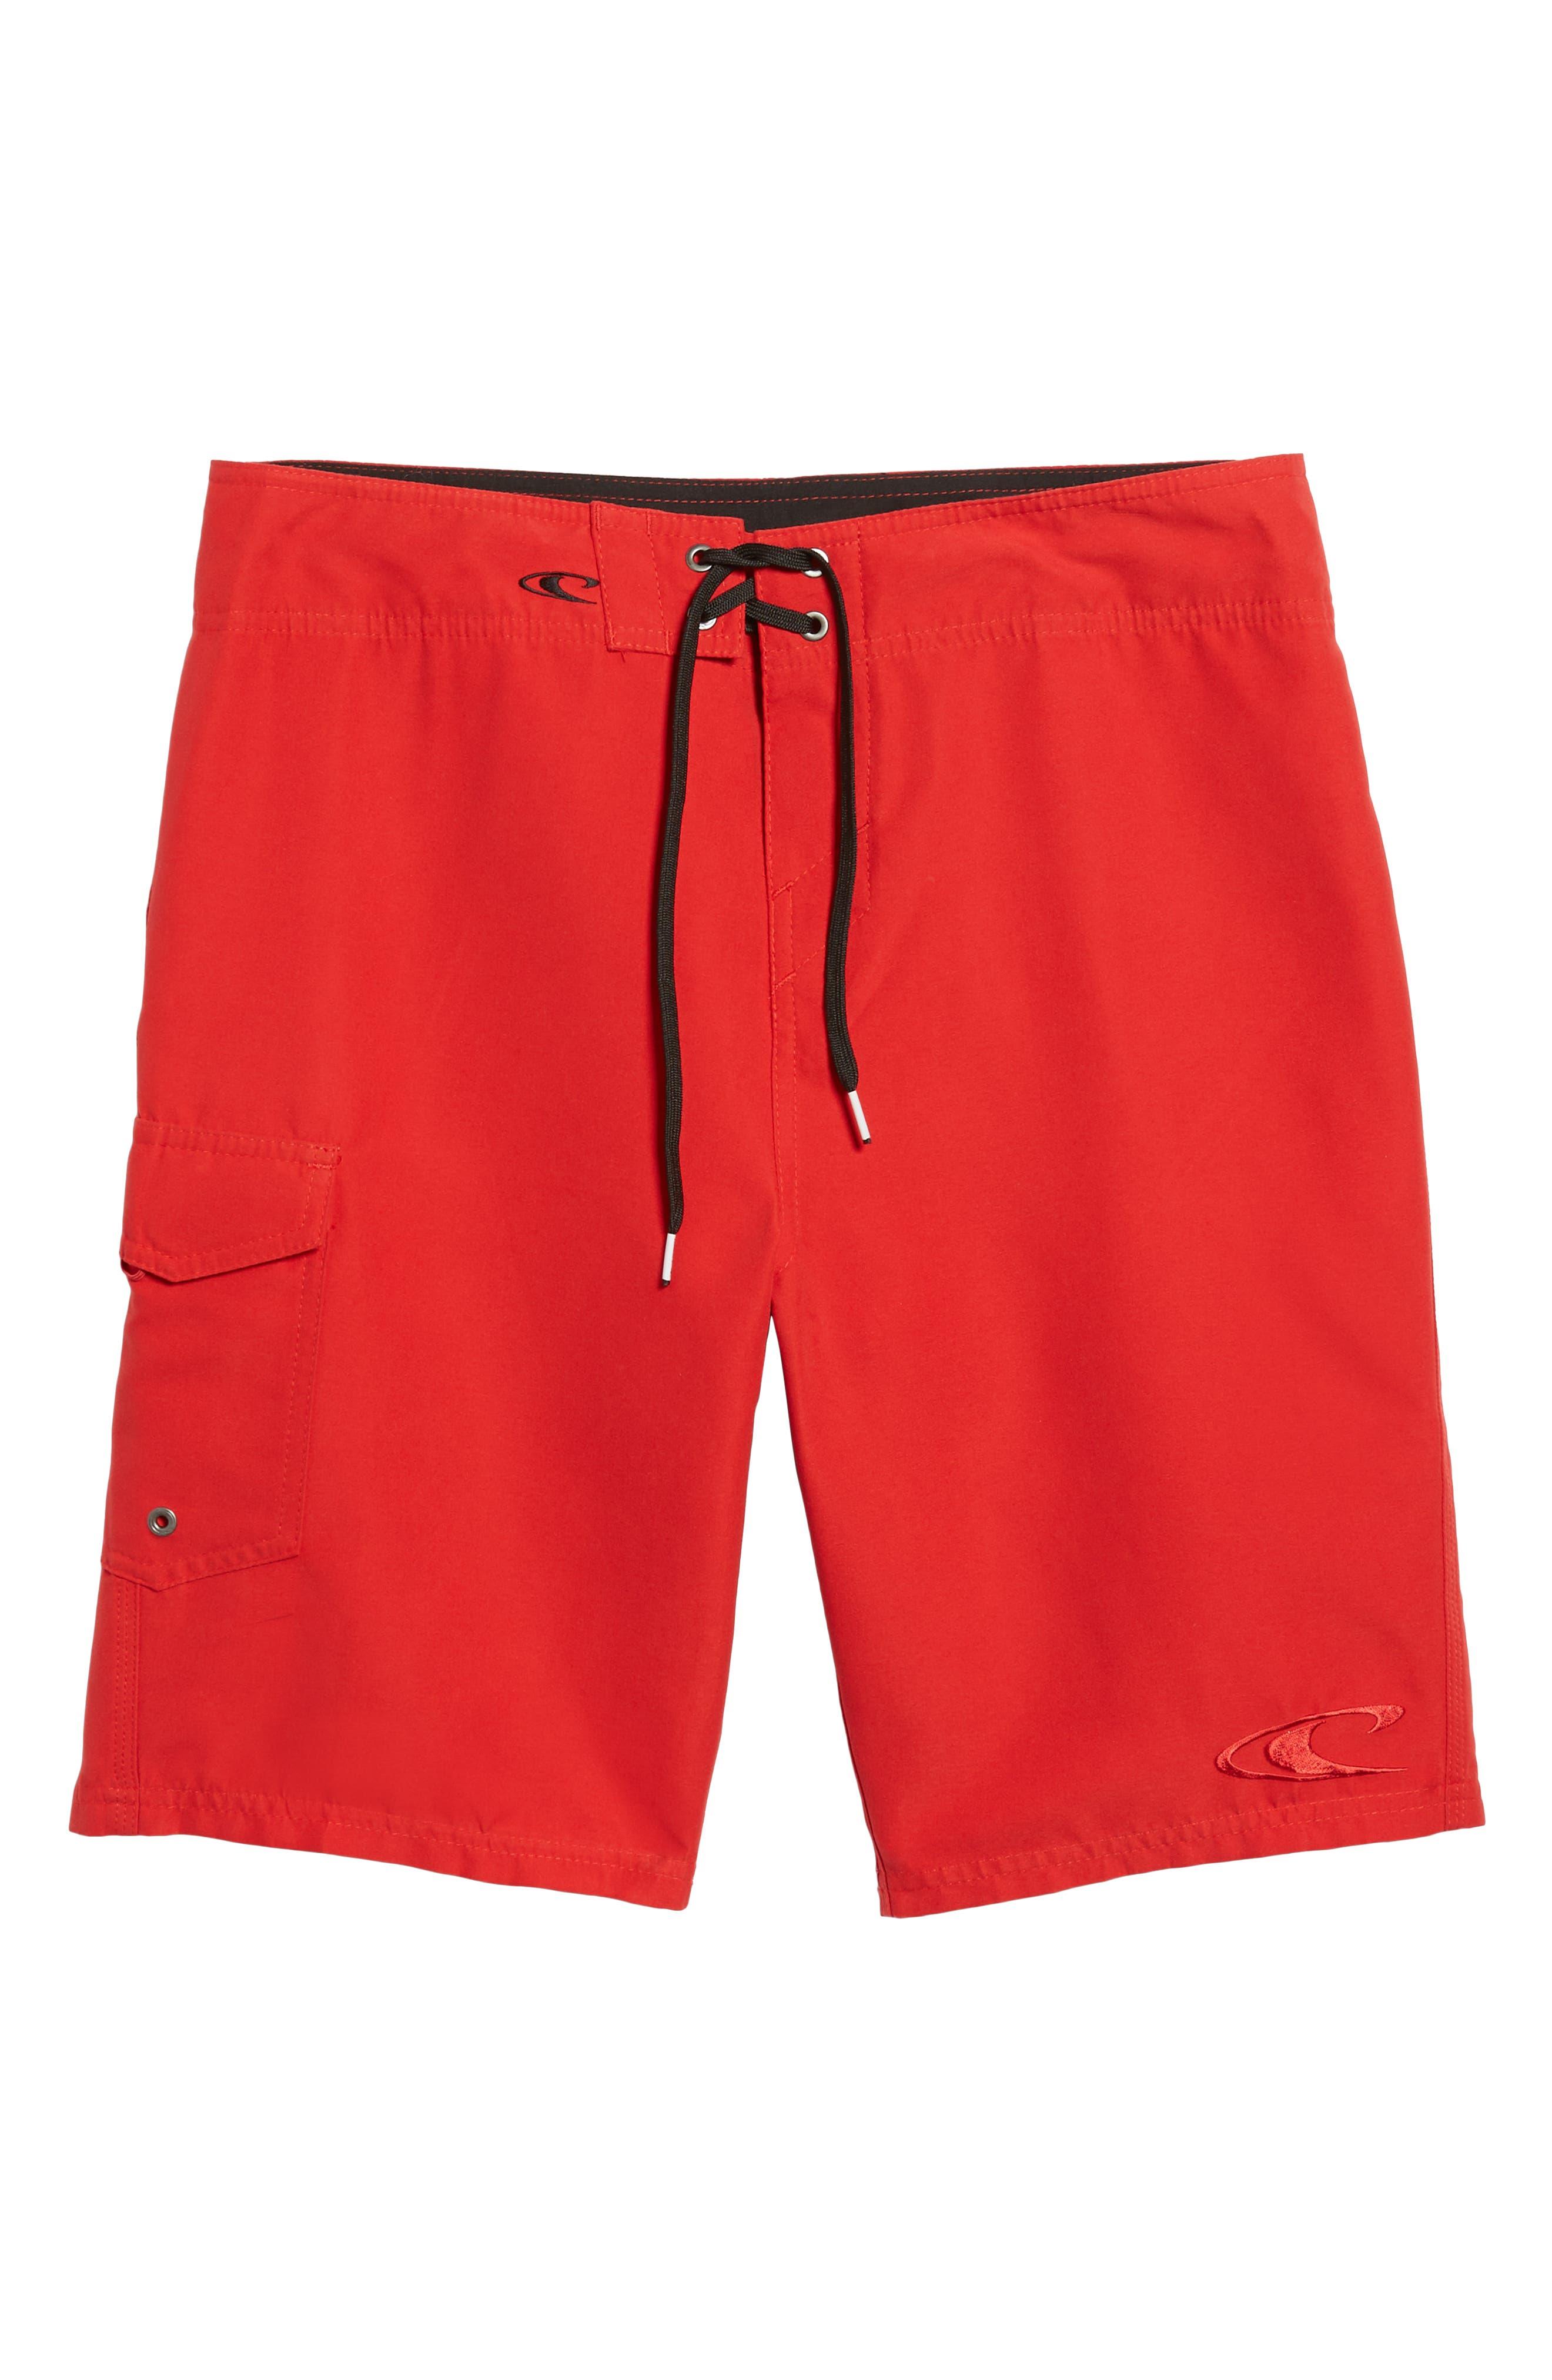 Santa Cruz Board Shorts,                             Alternate thumbnail 6, color,                             Red